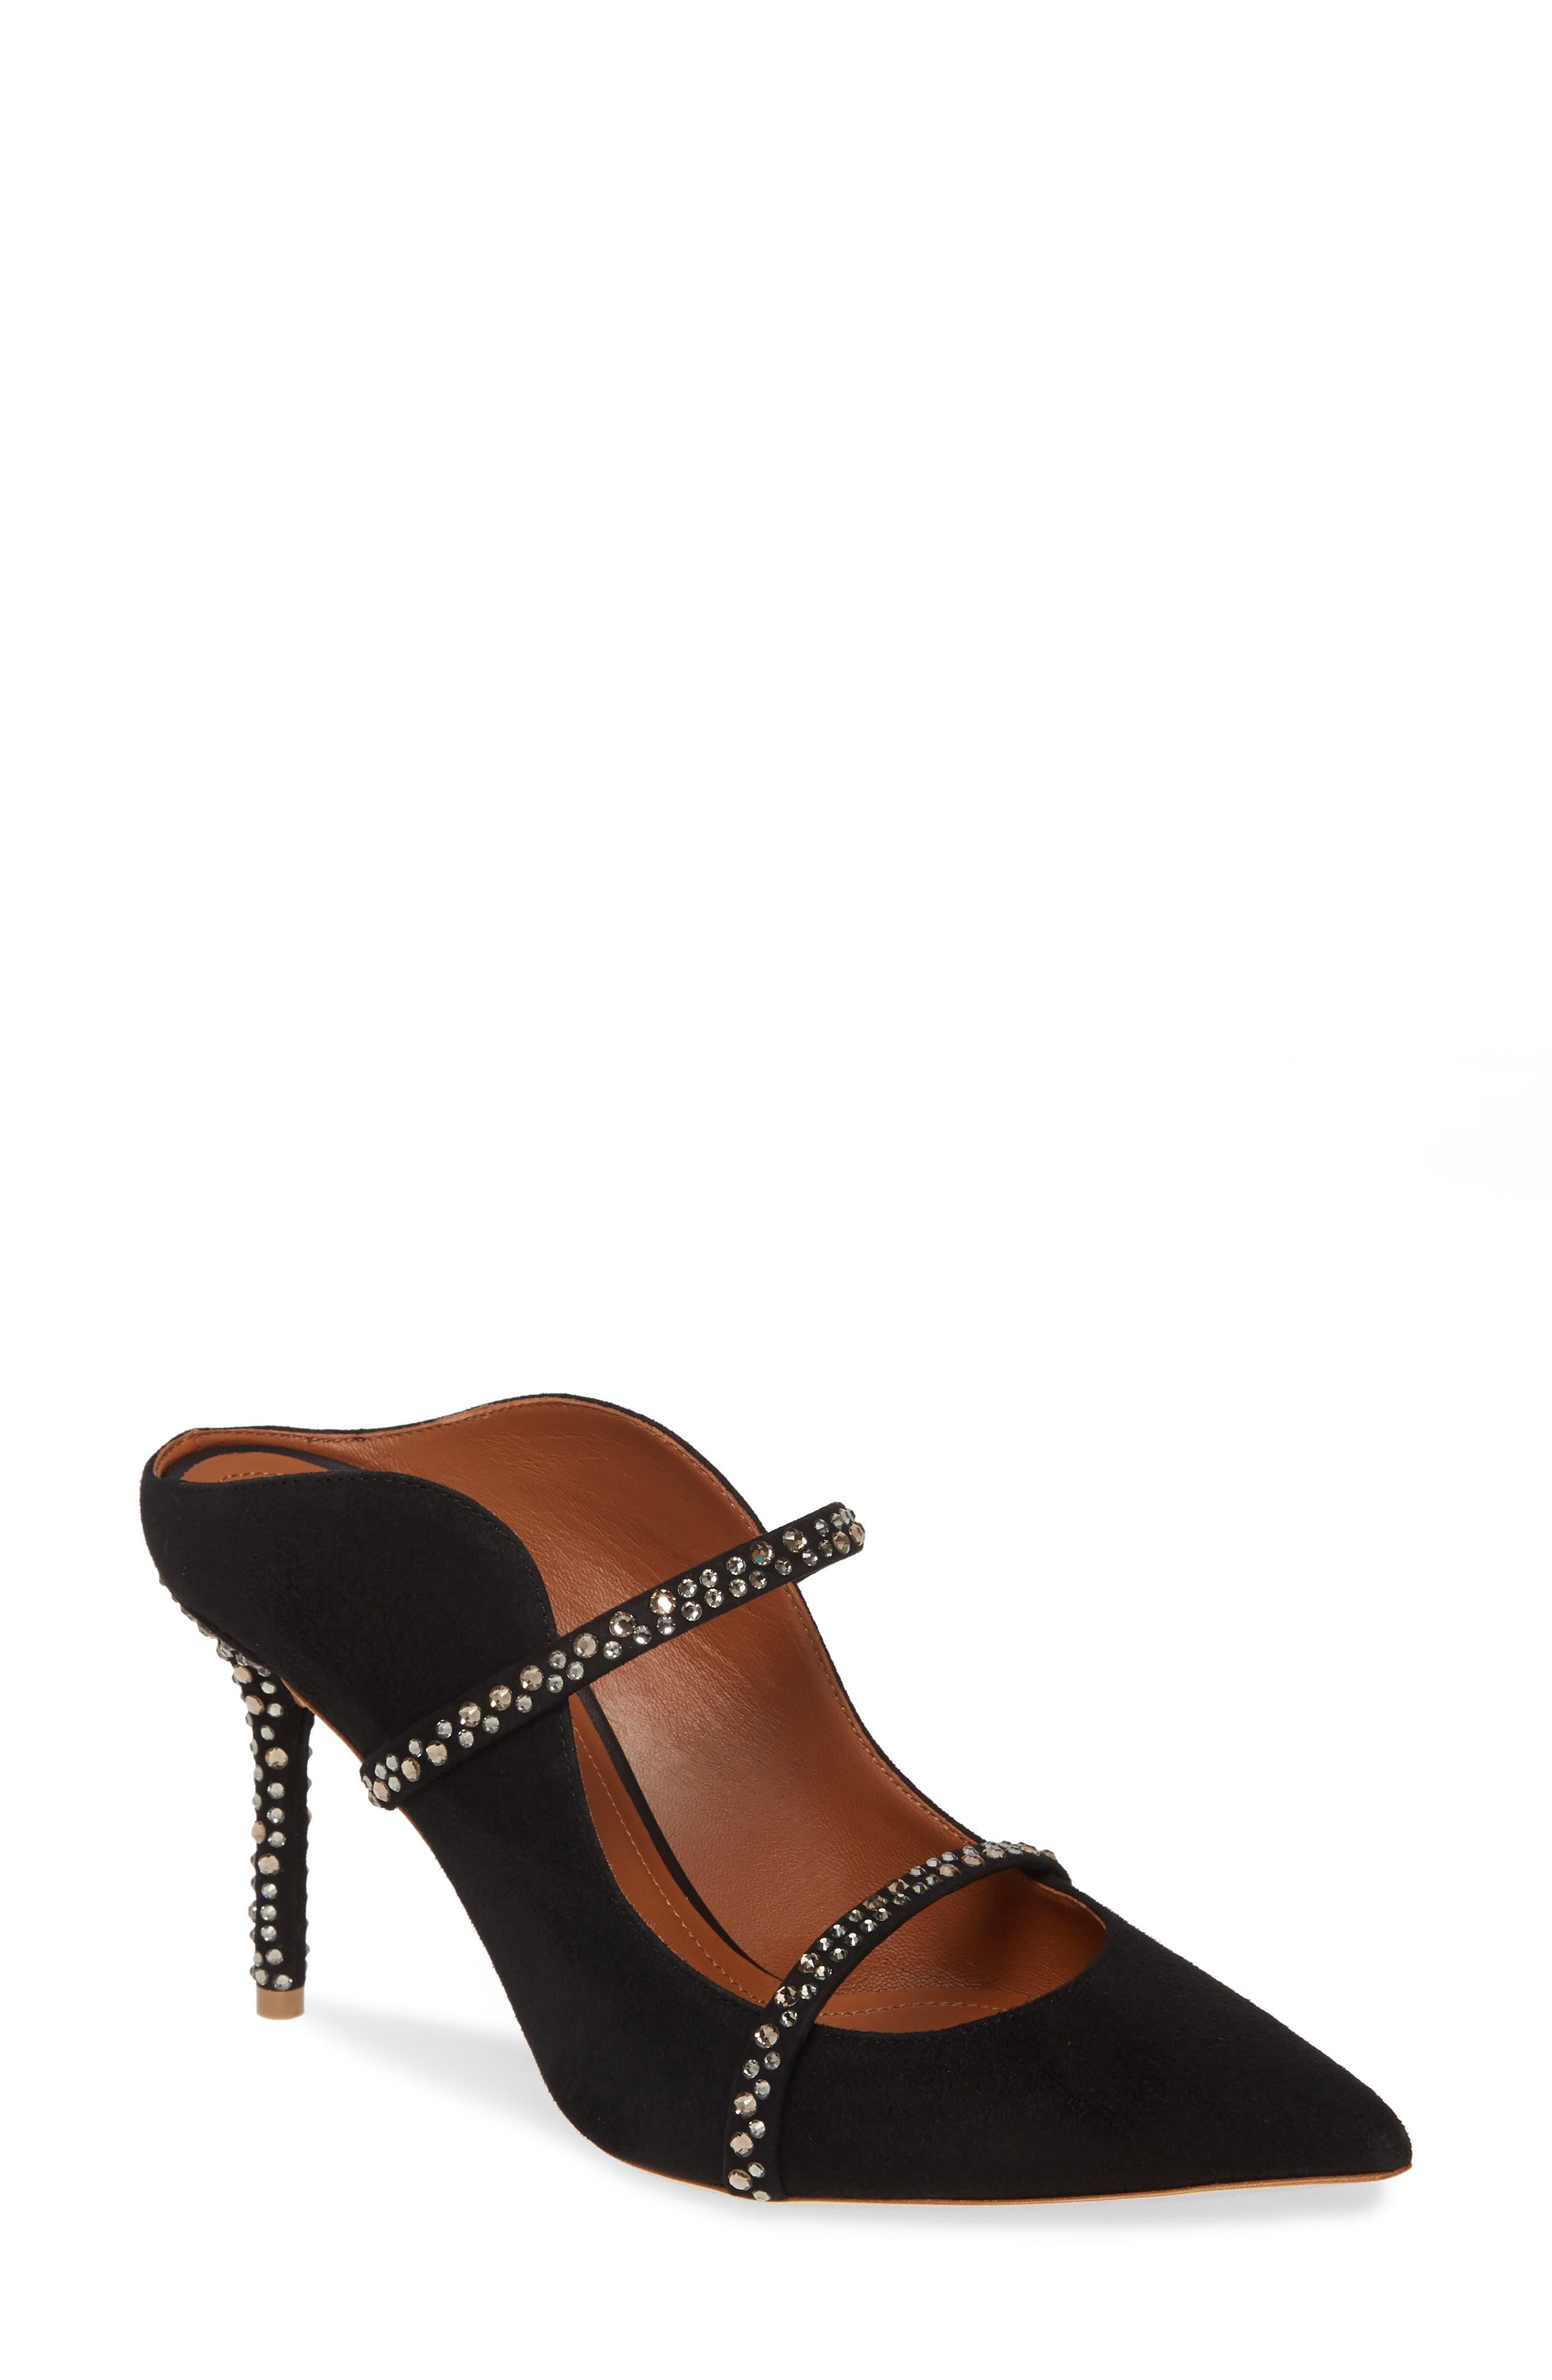 Malone Souliers Maureen Crystal Embellished Mule - Black